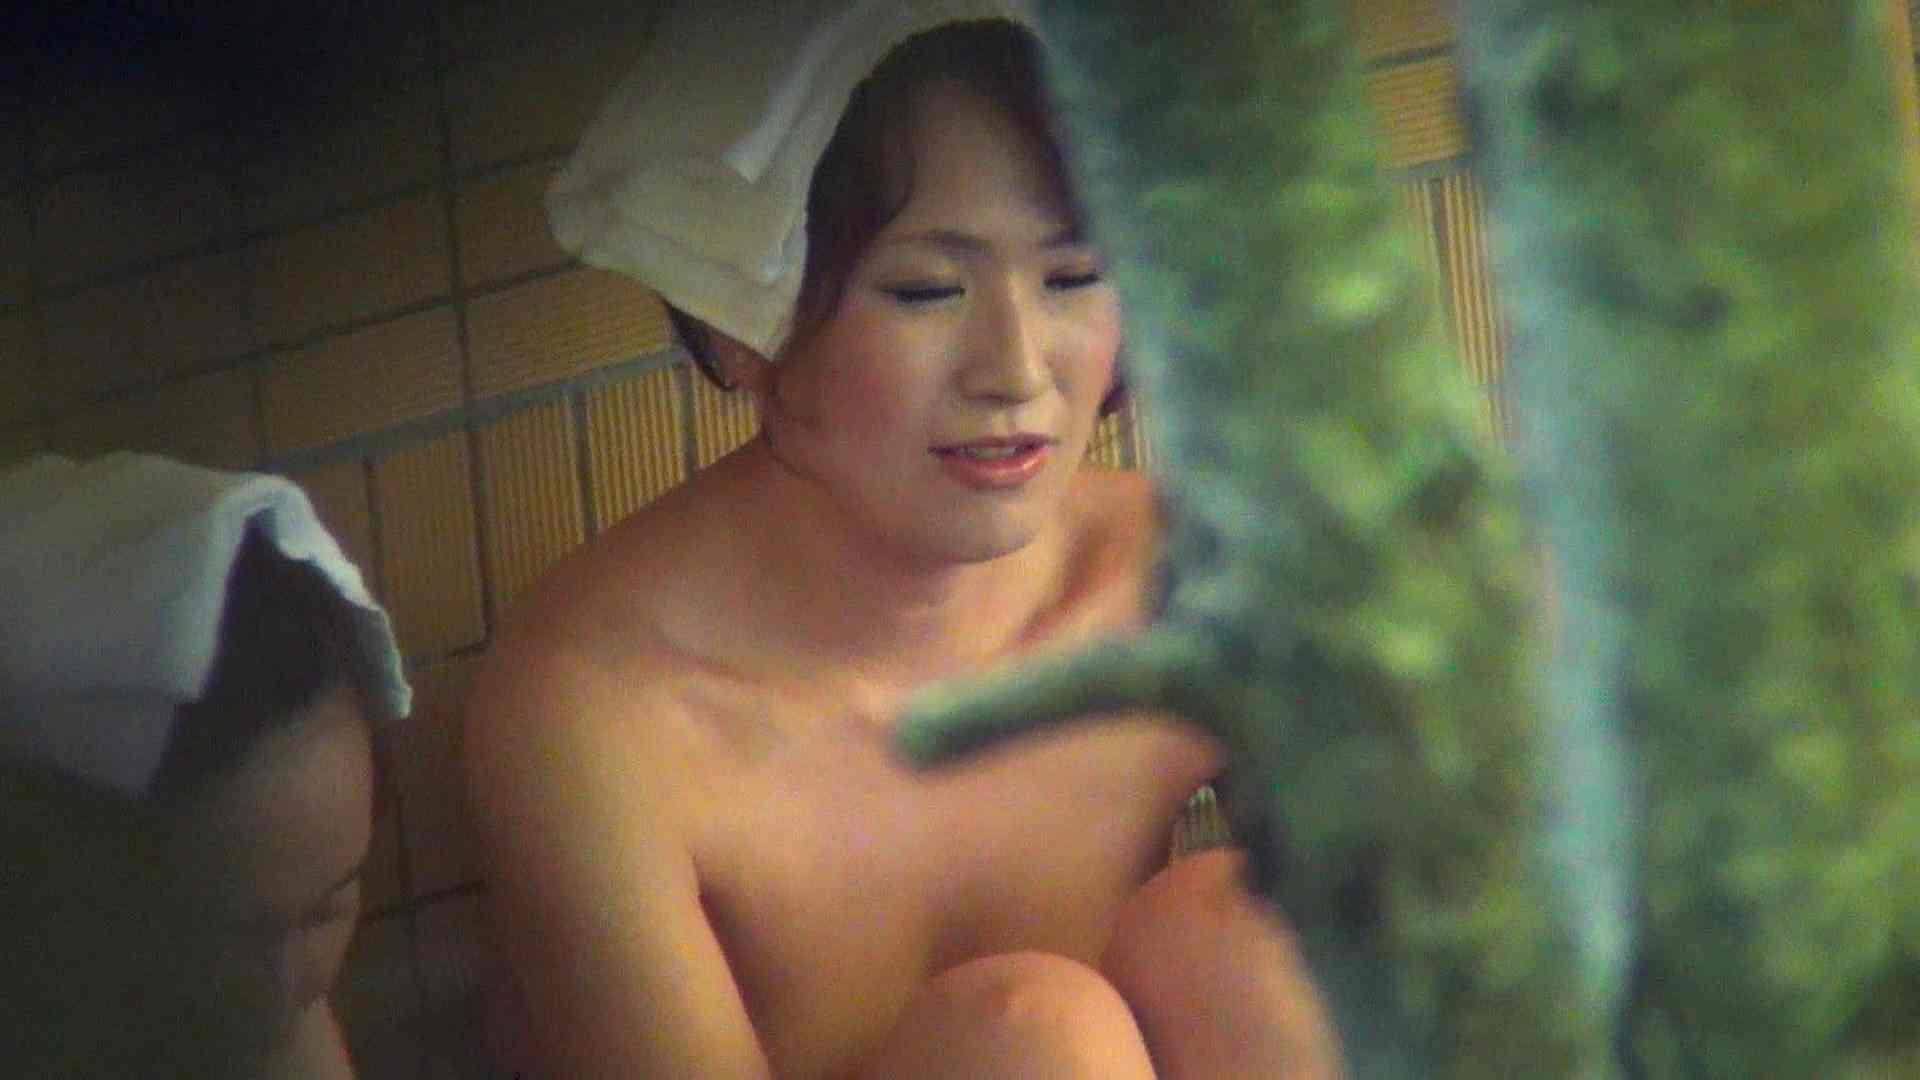 Aquaな露天風呂Vol.272 HなOL   盗撮  63pic 6